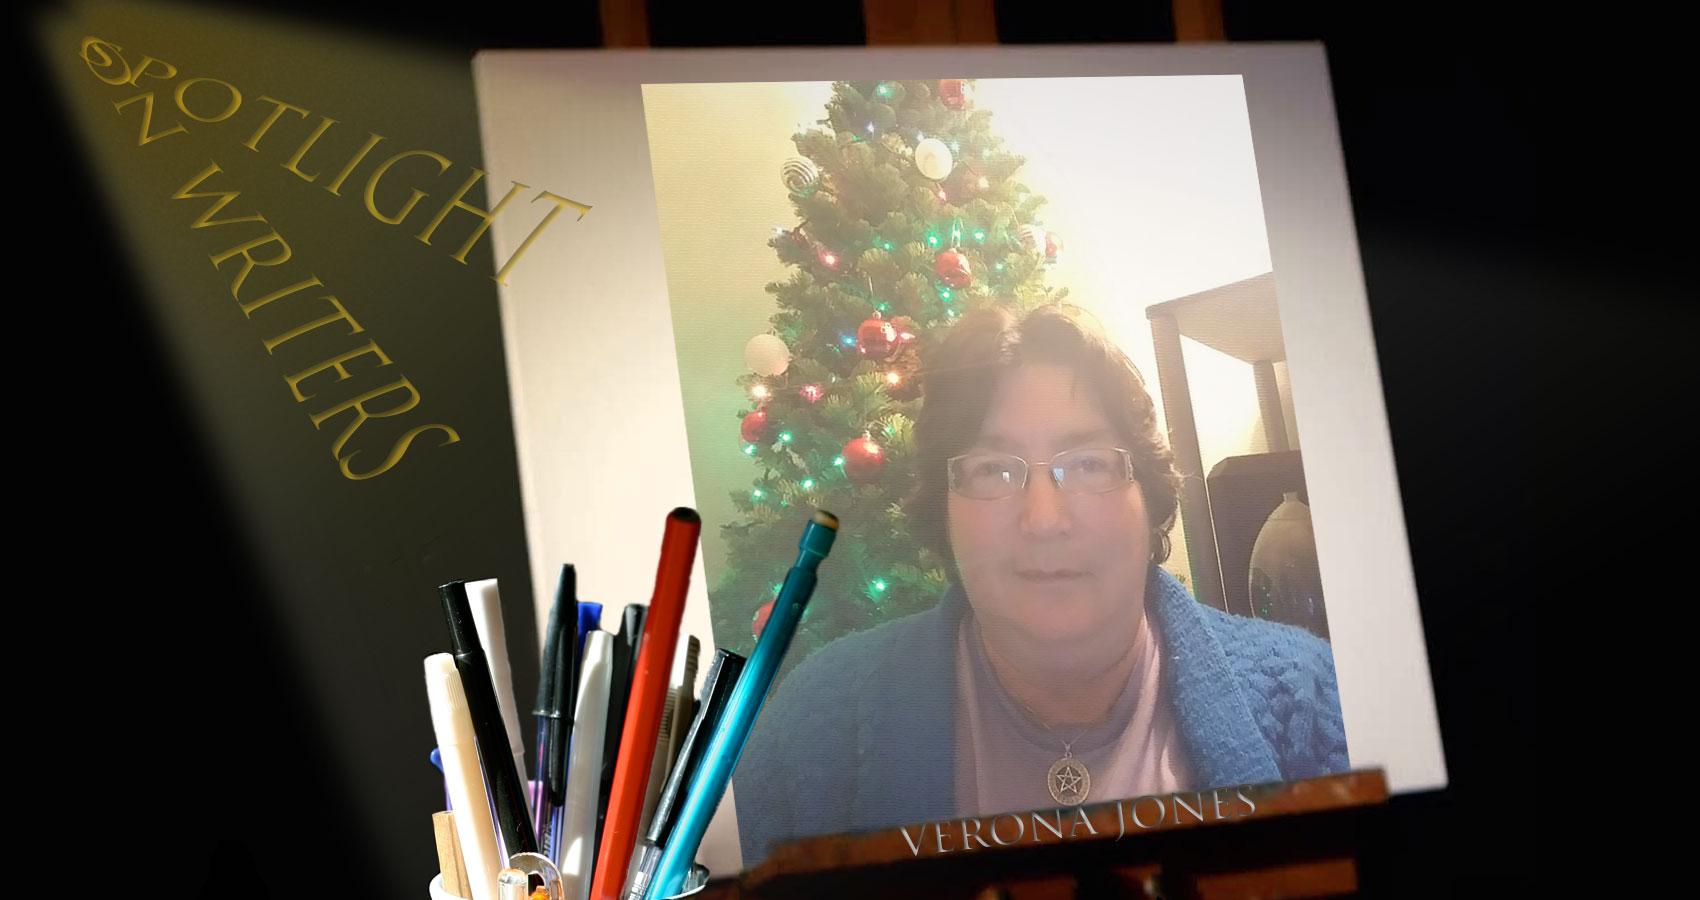 Spotlight On Writers - Verona Jones interview at Spillwords.com